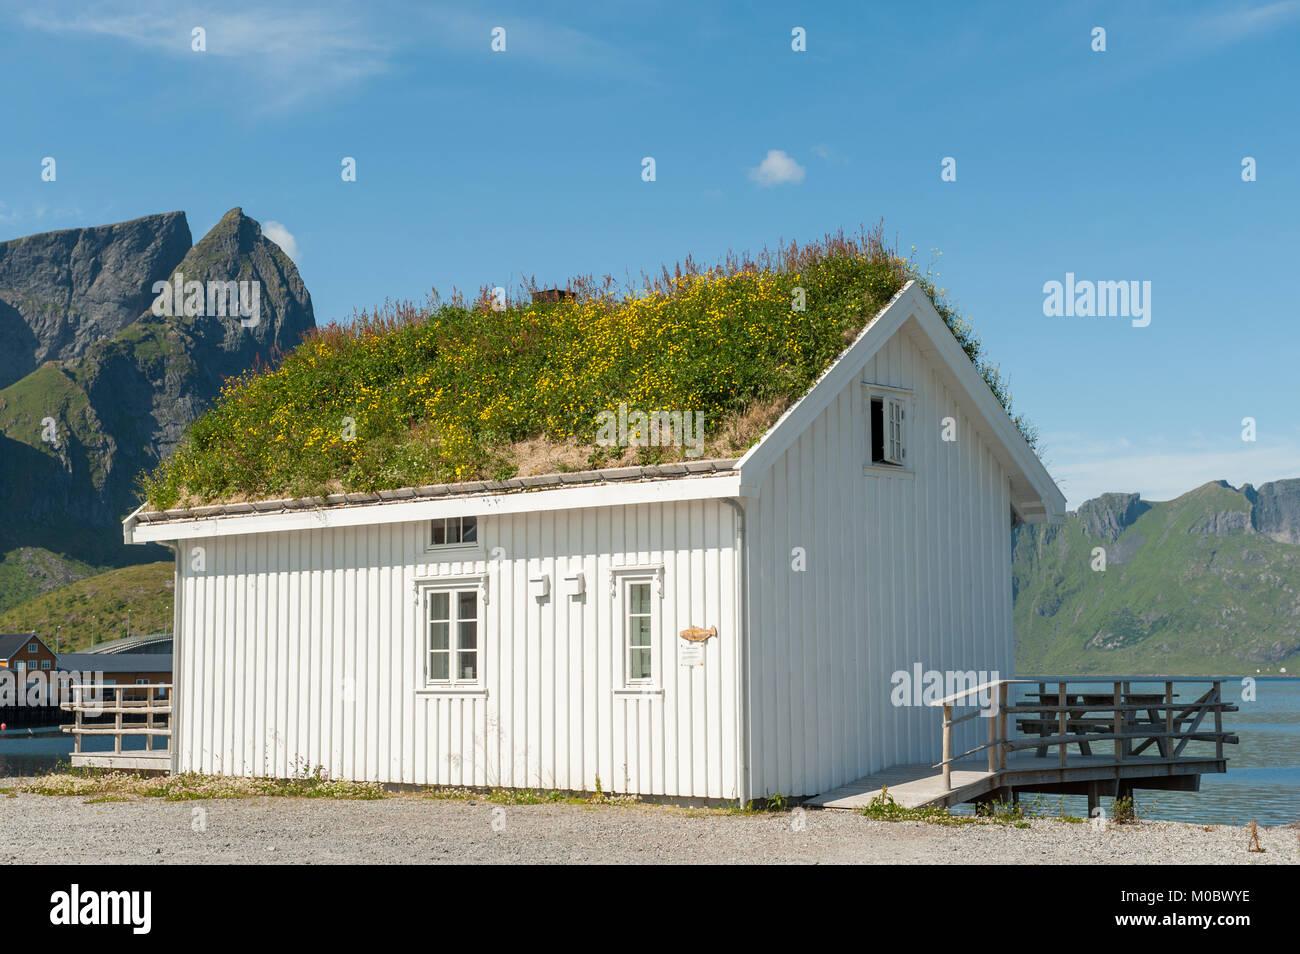 Traditional rural building in coast landscape on Lofoten islands in northern Norway. Lofoten is a popular tourist - Stock Image